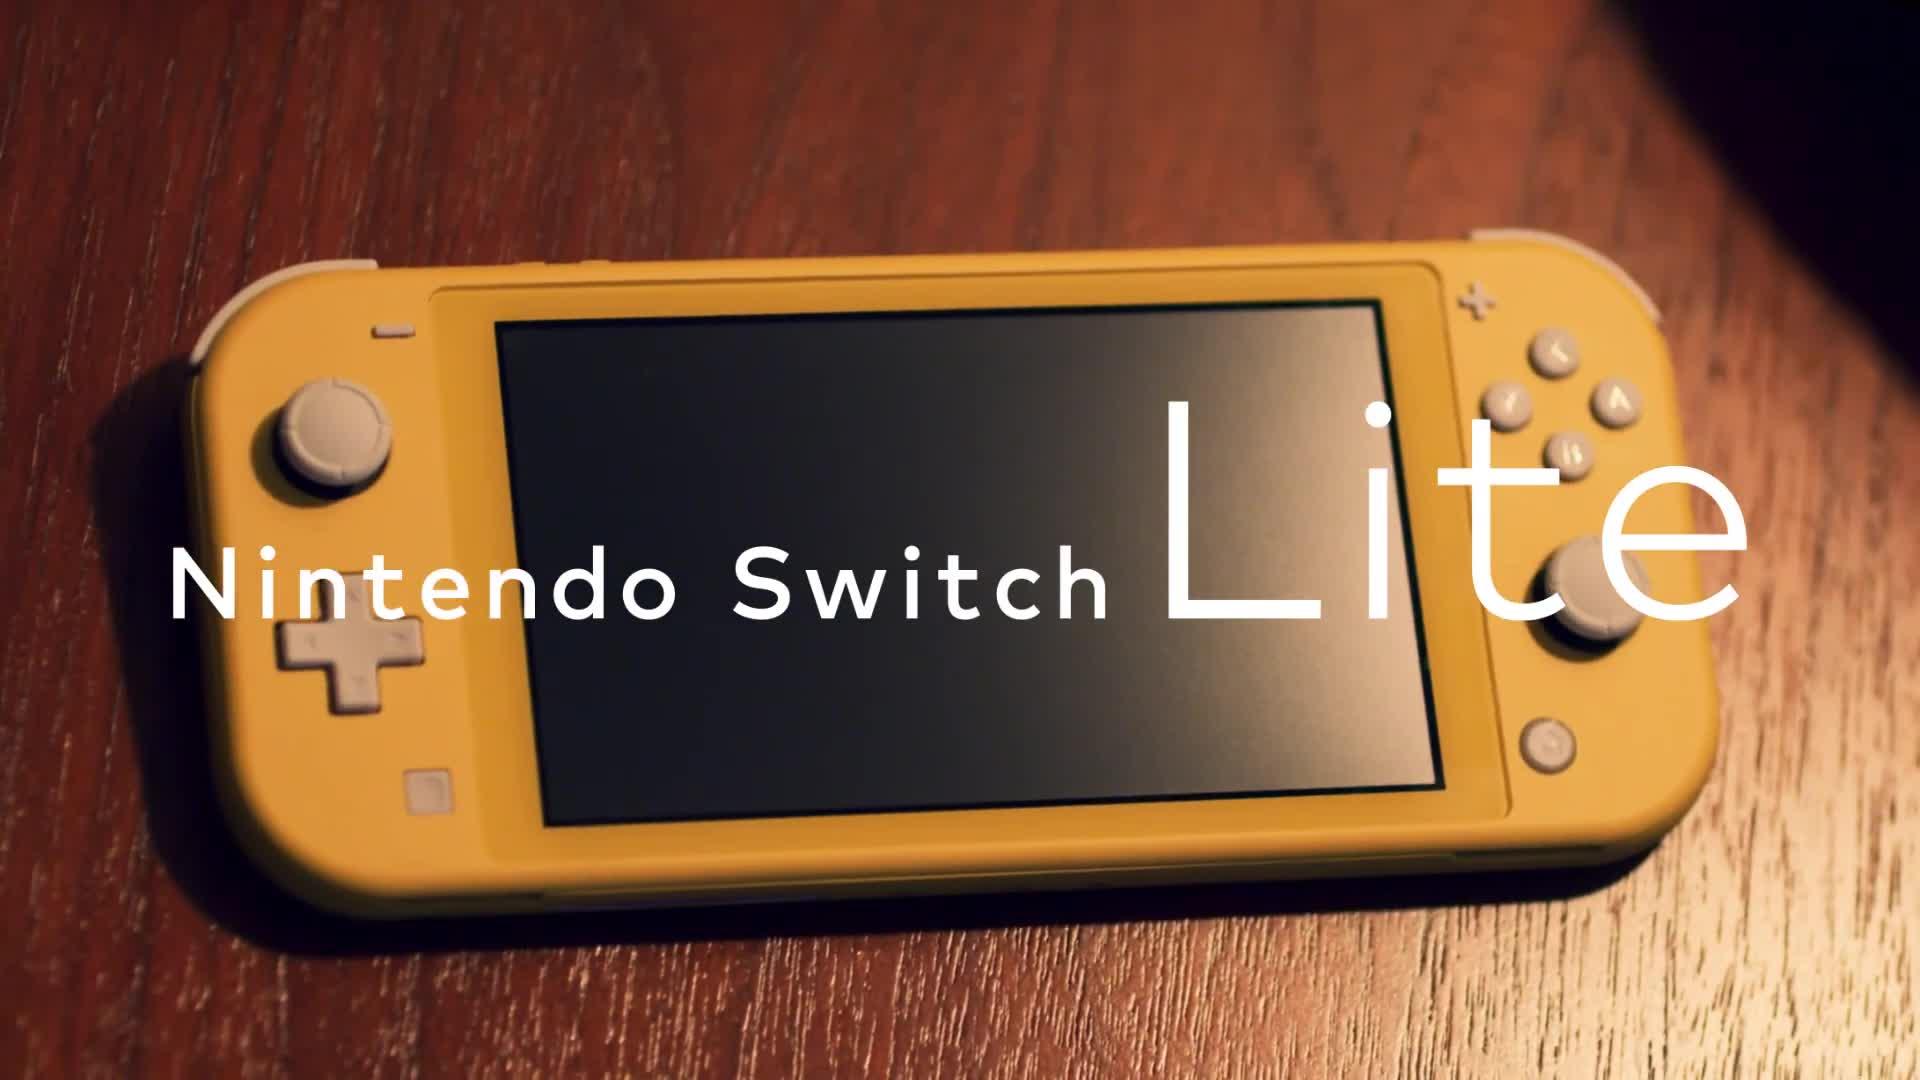 Gaming, Konsole, Nintendo, Nintendo Switch, Nintendo Konsole, Switch, Handheld, Nintendo Switch Lite, Switch Lite